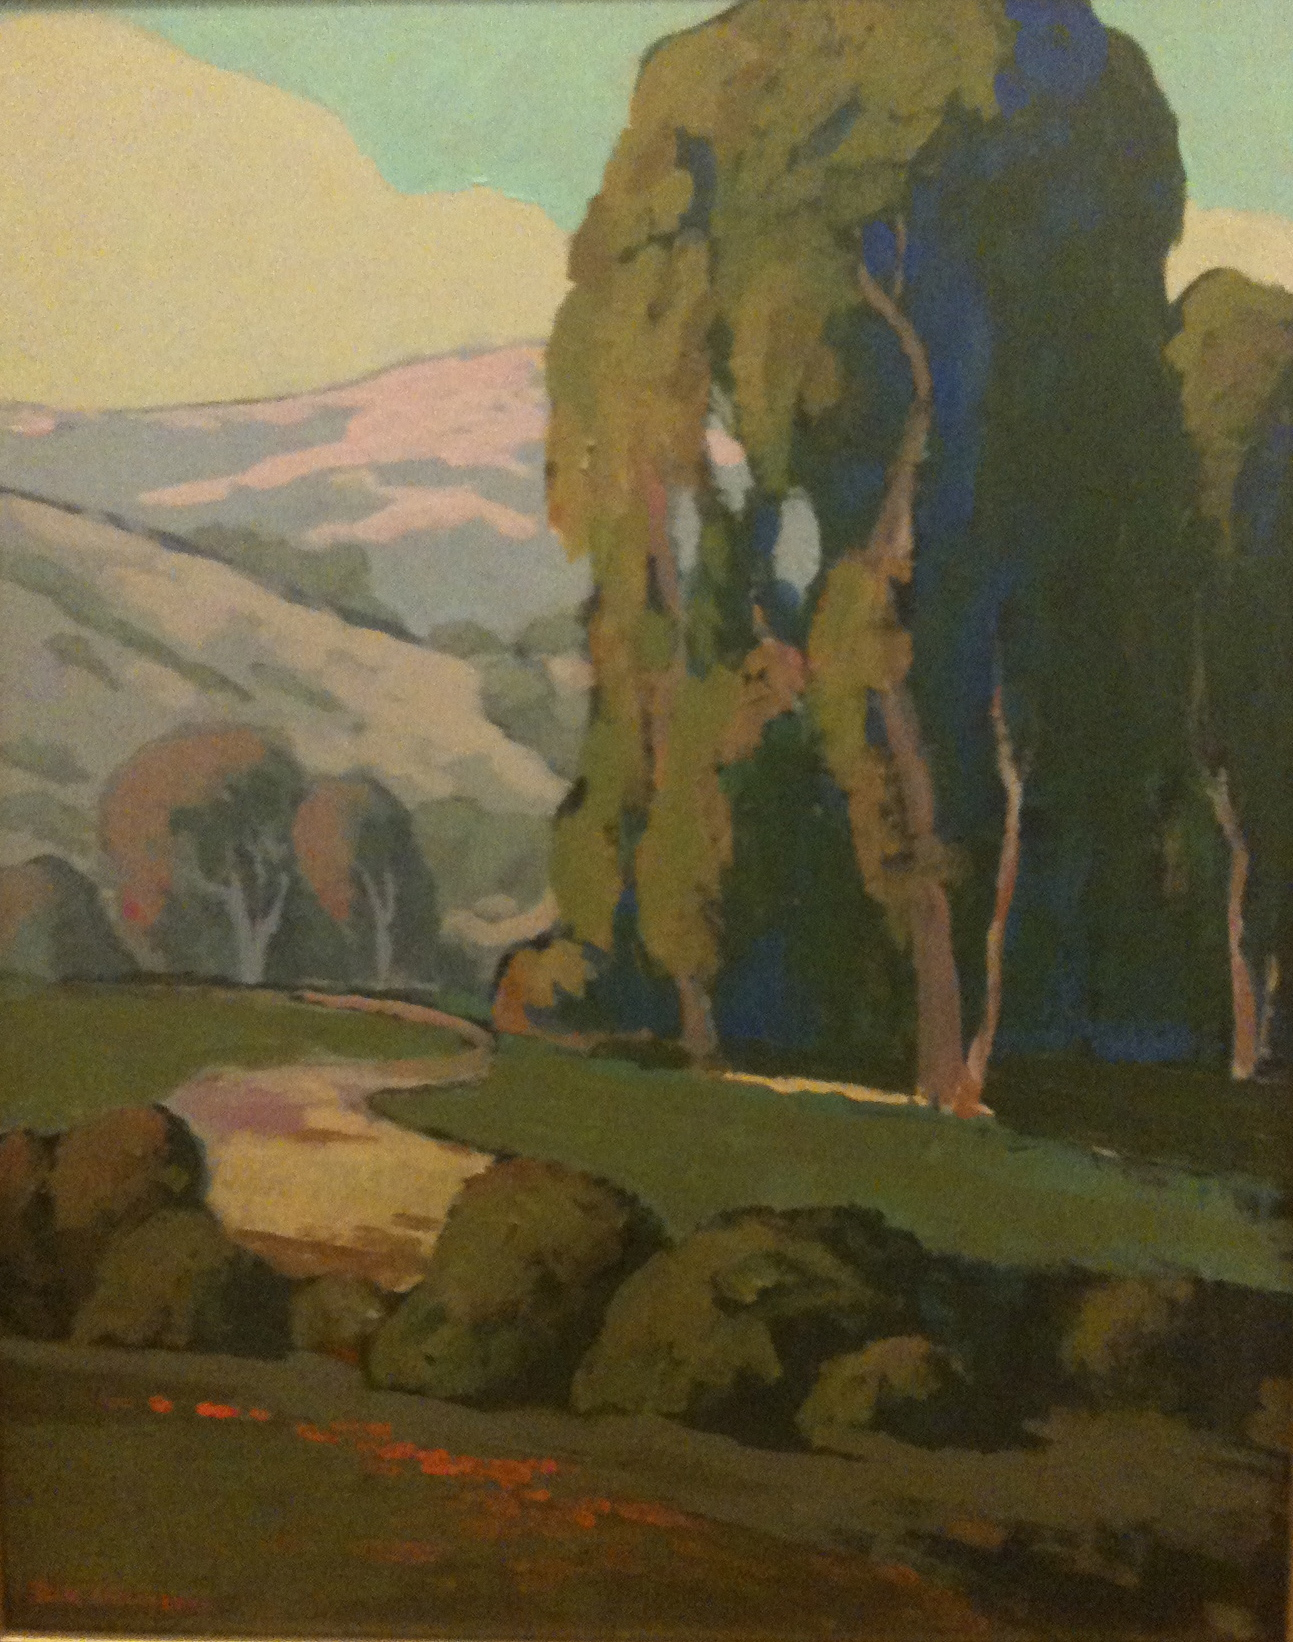 Jack Cassinetto, Eucalyptus-Novato, eucalyptus school, plein air